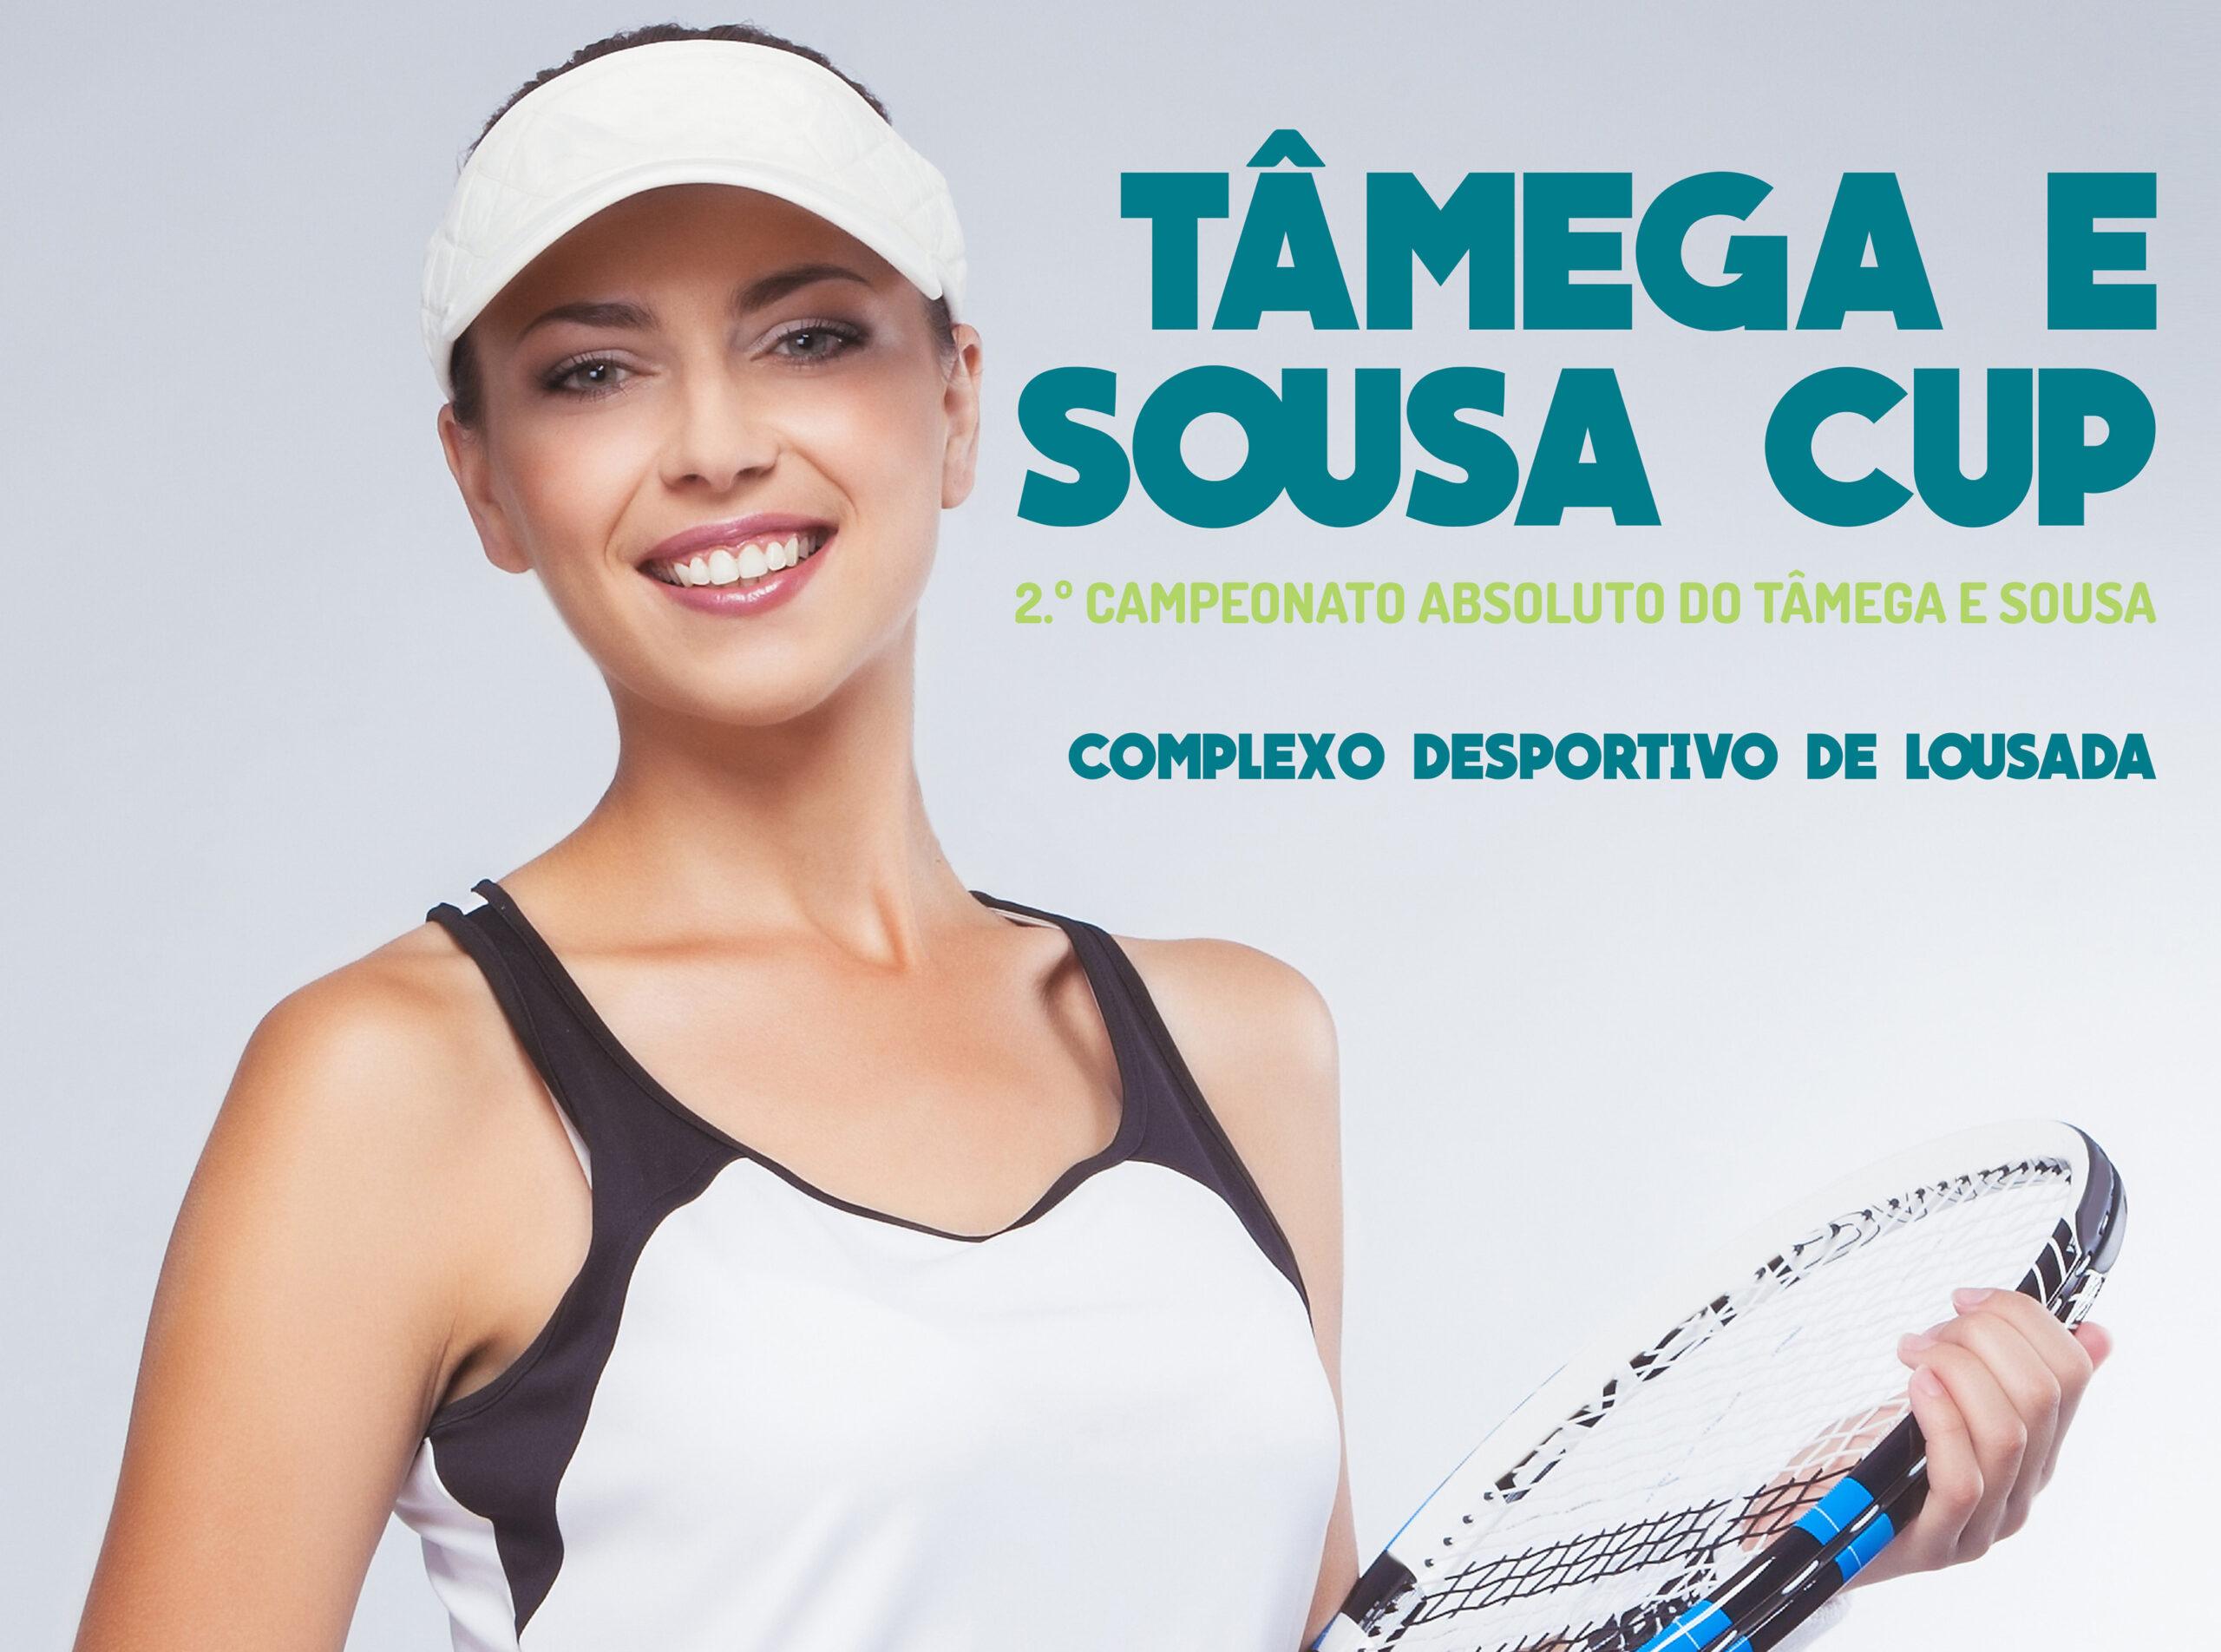 Tâmega e Sousa Cup 2017 1 1 scaled